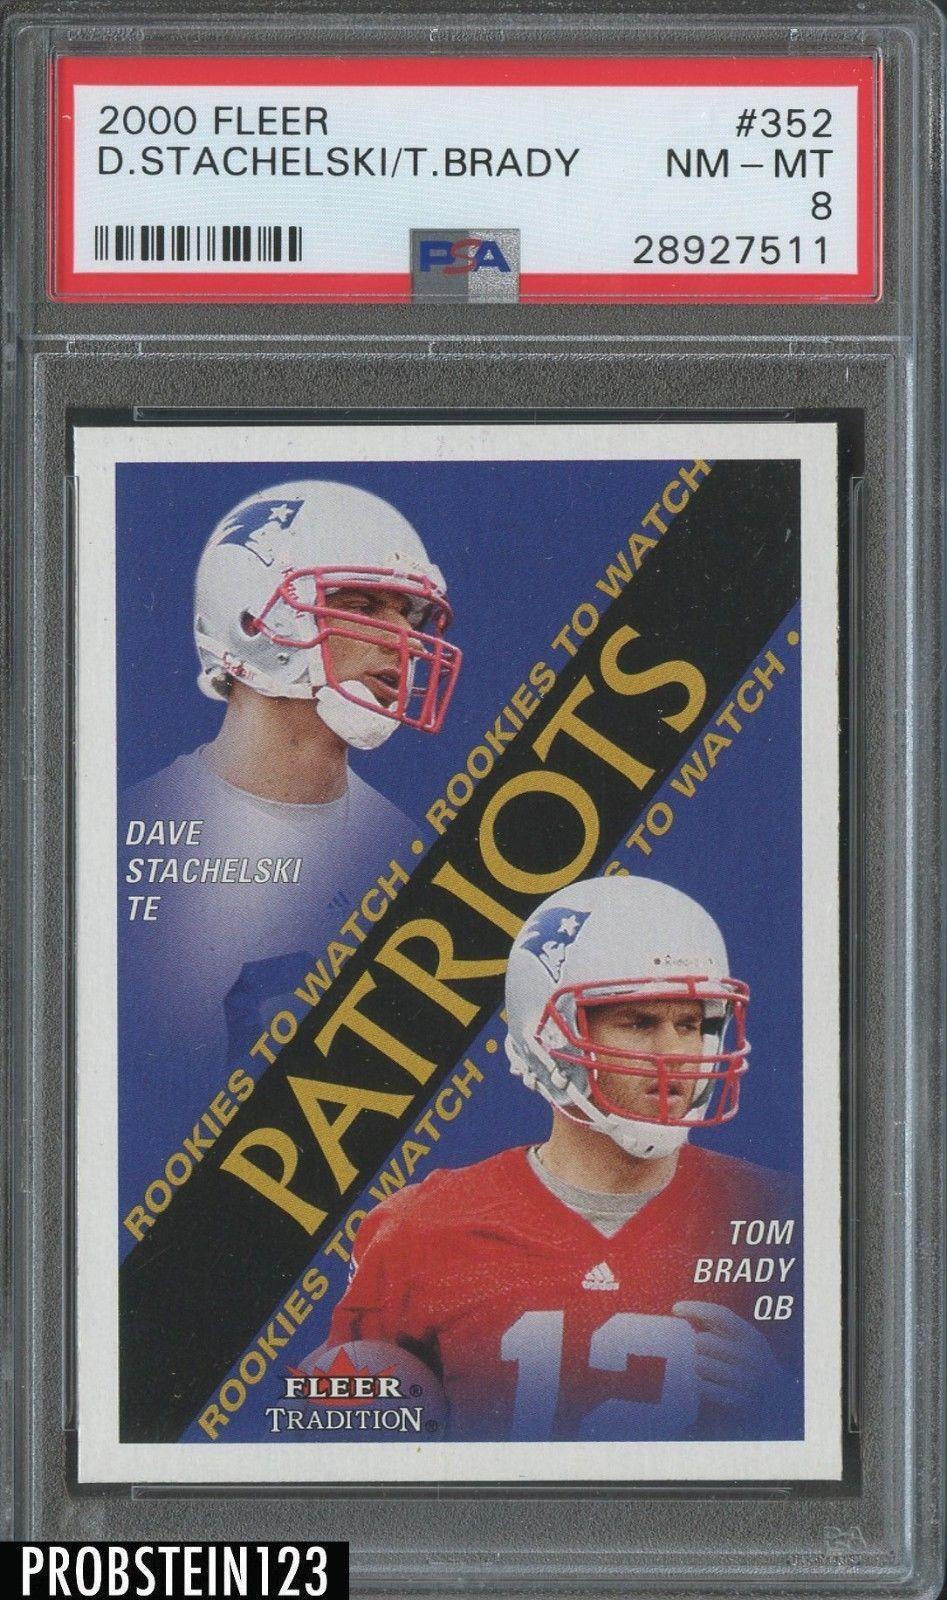 Pin By Francis Chevalier On Cartes De Football In 2020 Tom Brady Tom Brady News Football Cards